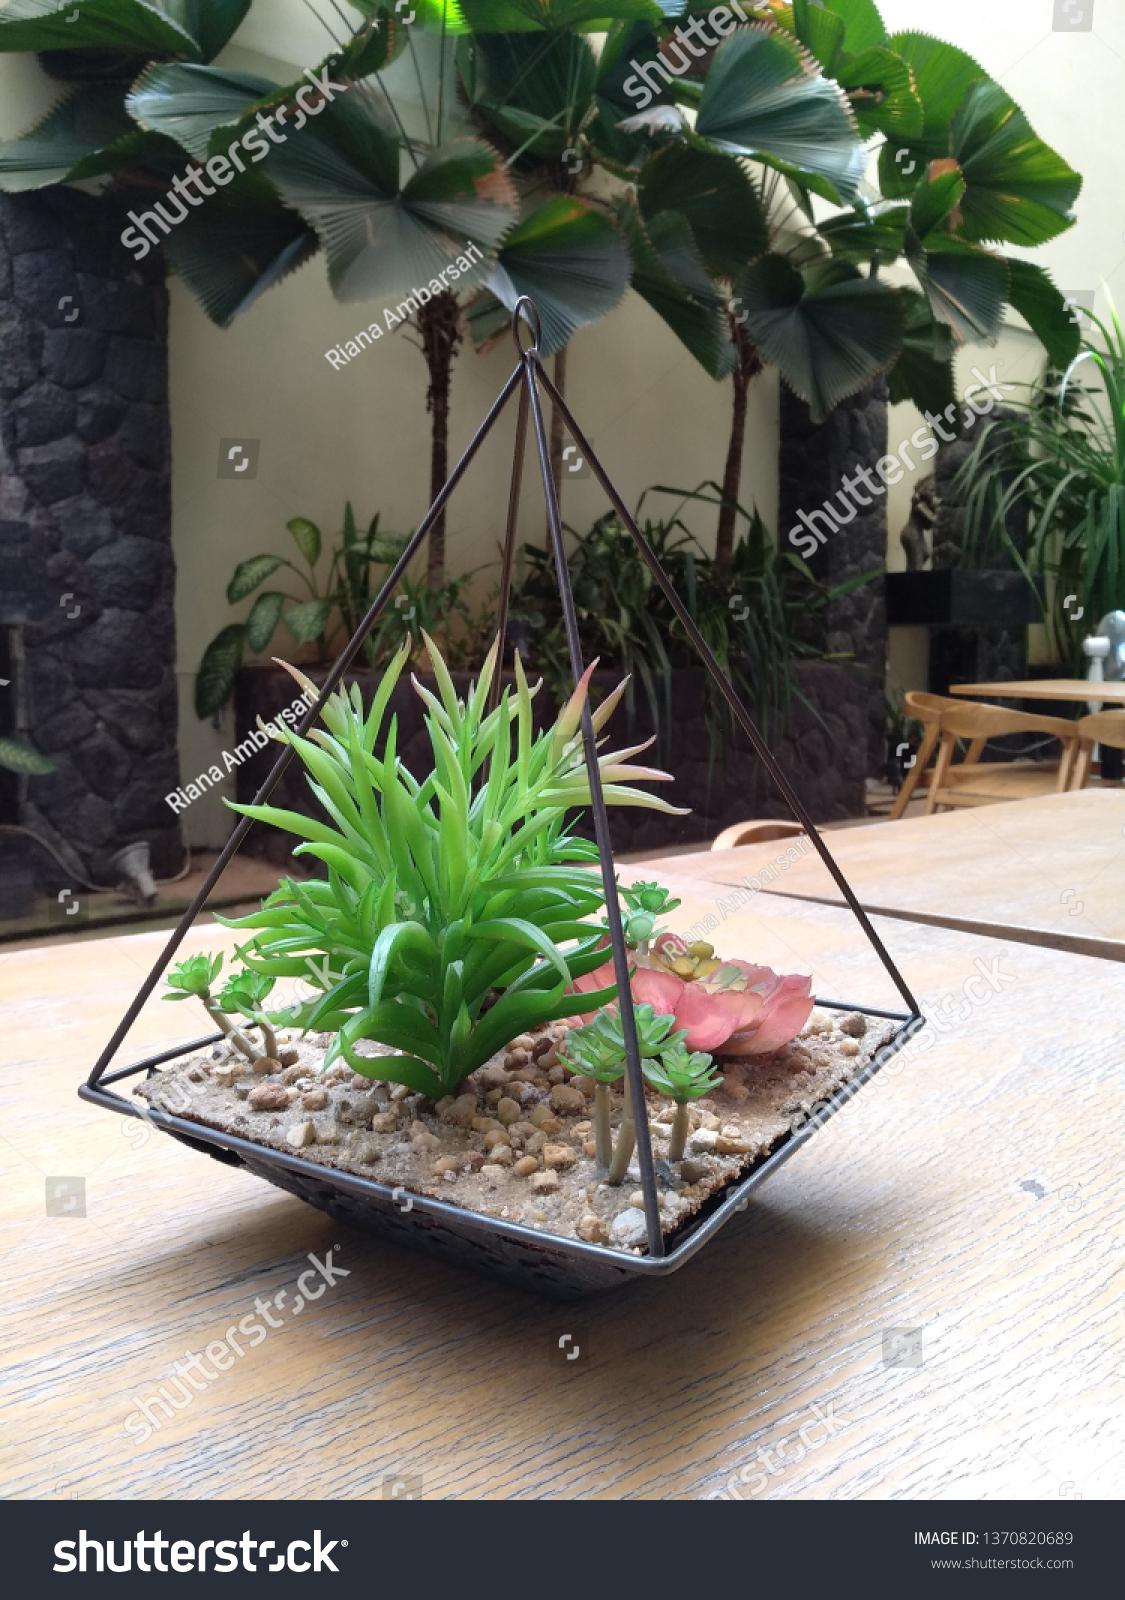 Succulent Terrarium On Wooden Table Garden Stock Photo Edit Now 1370820689